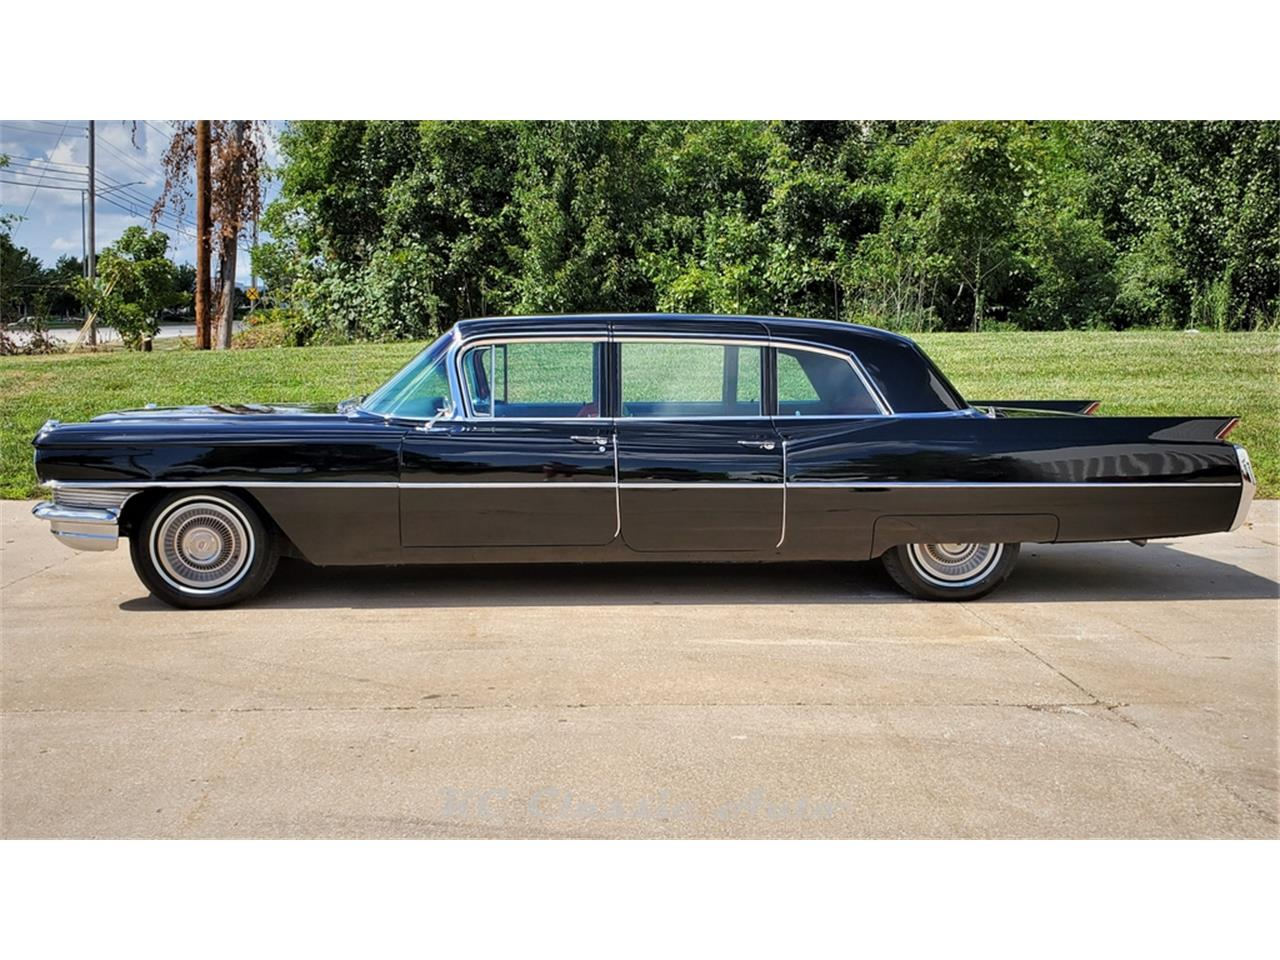 1964 Cadillac Fleetwood (CC-1386839) for sale in Lenexa, Kansas